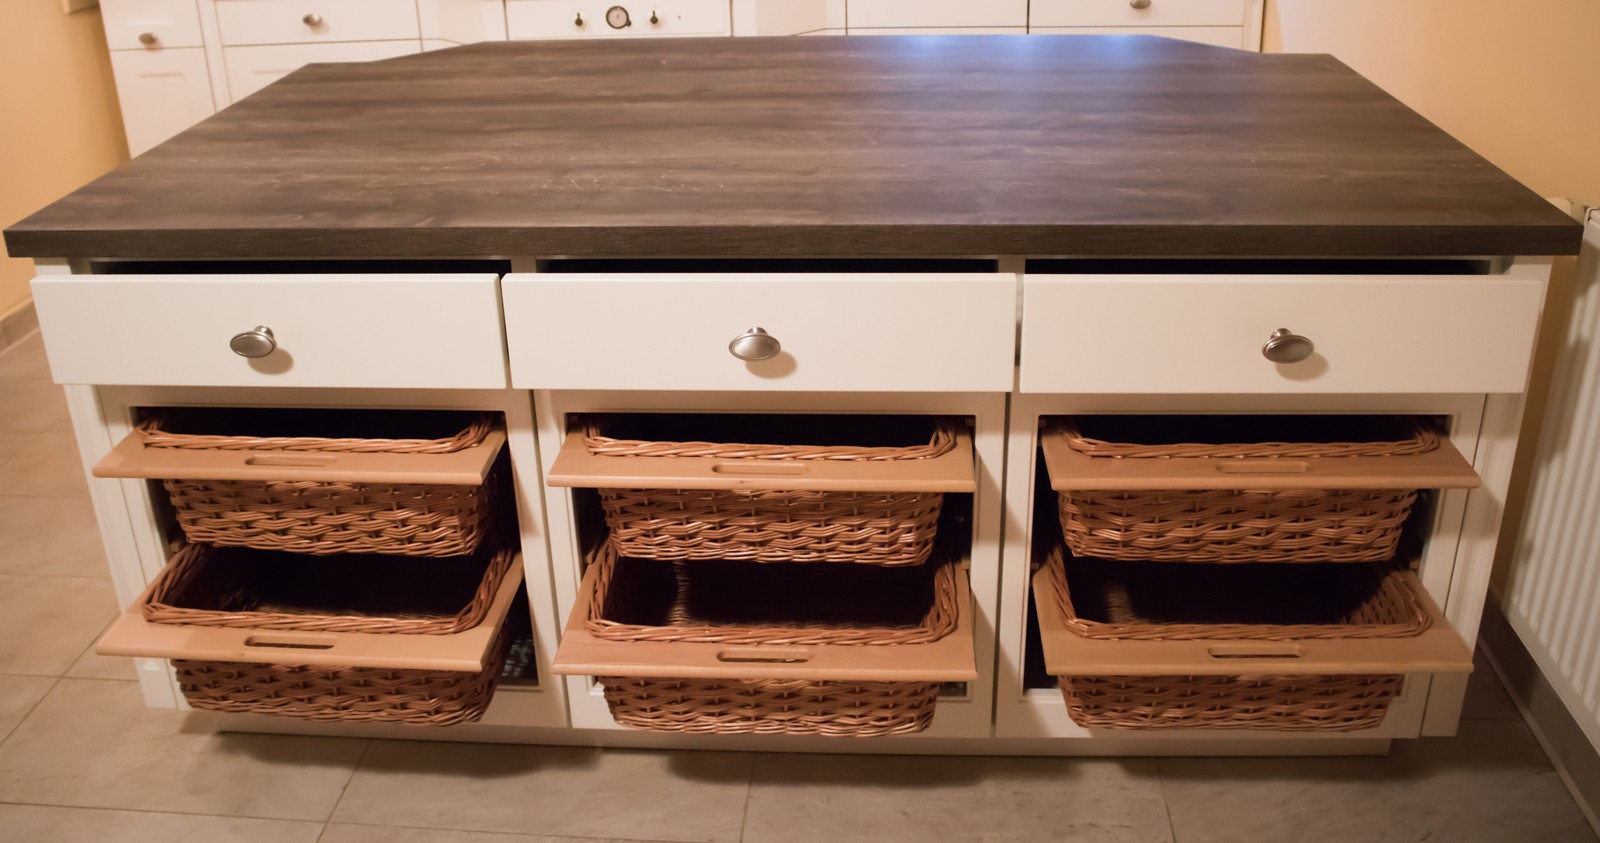 Referință - Bucătărie rustică Nobilia Chalet - Bej / Stejar Stem